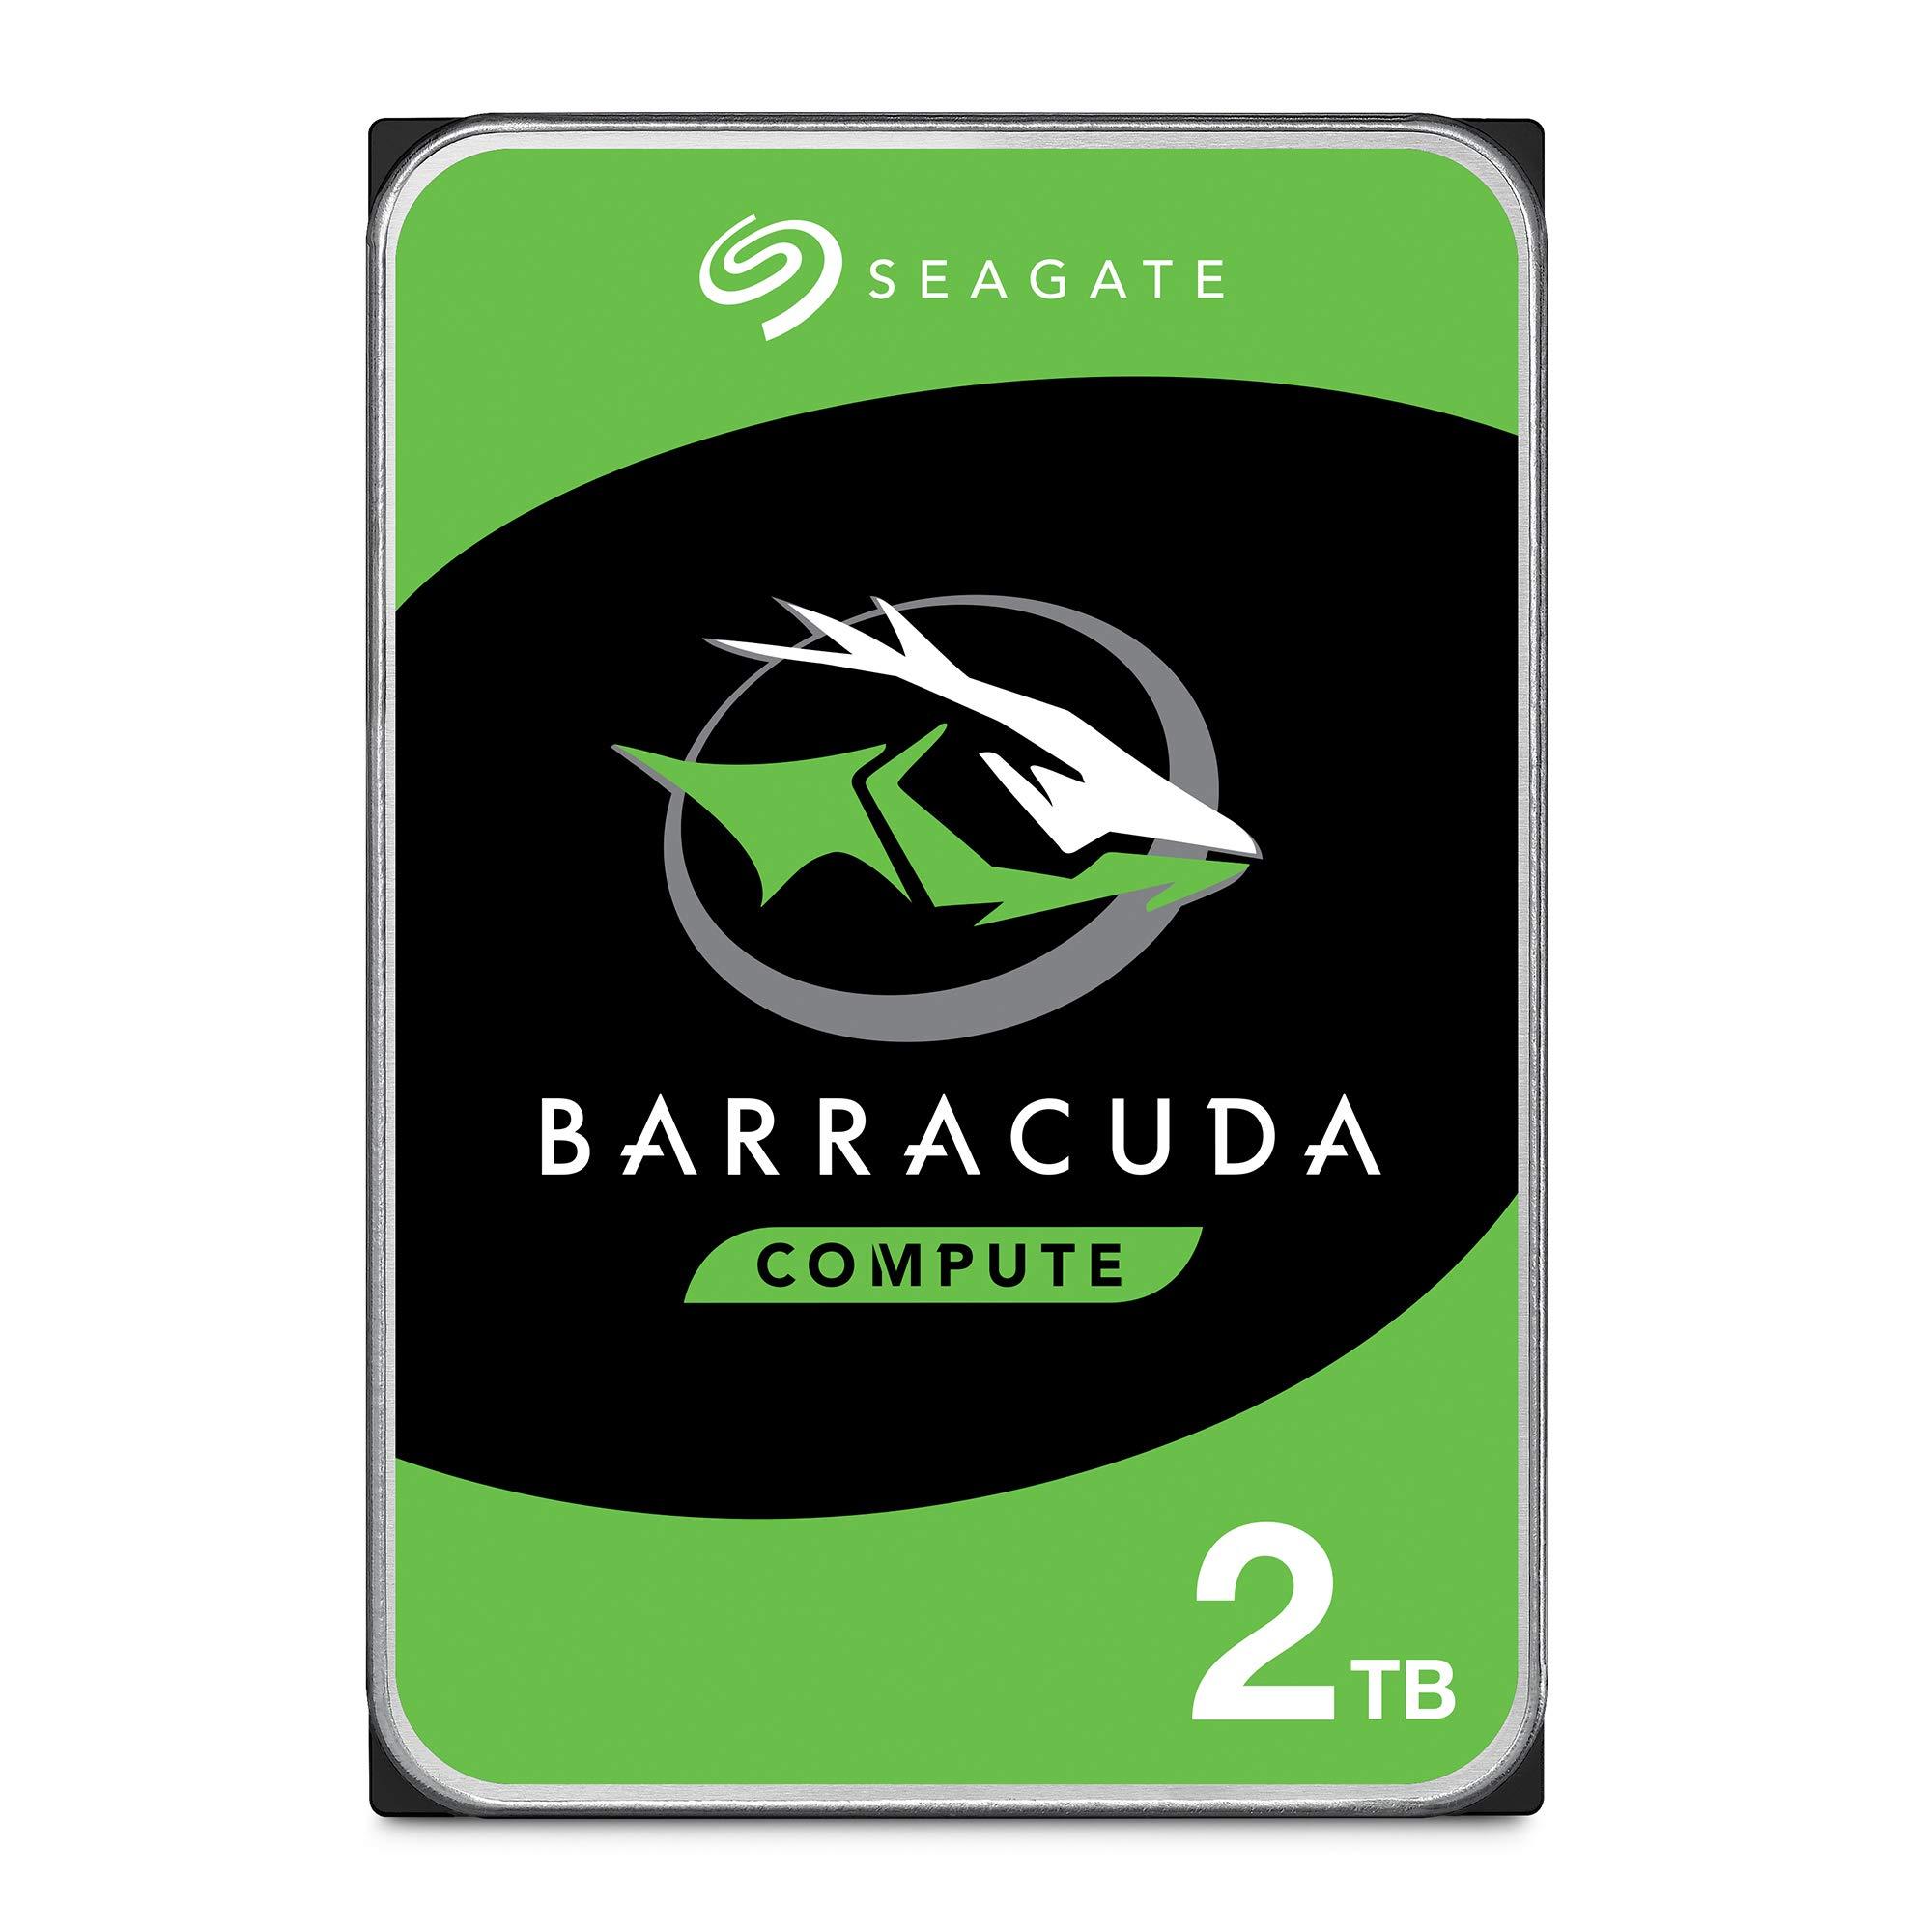 Seagate Barracuda 2TB HDD (ST2000DM005) product image